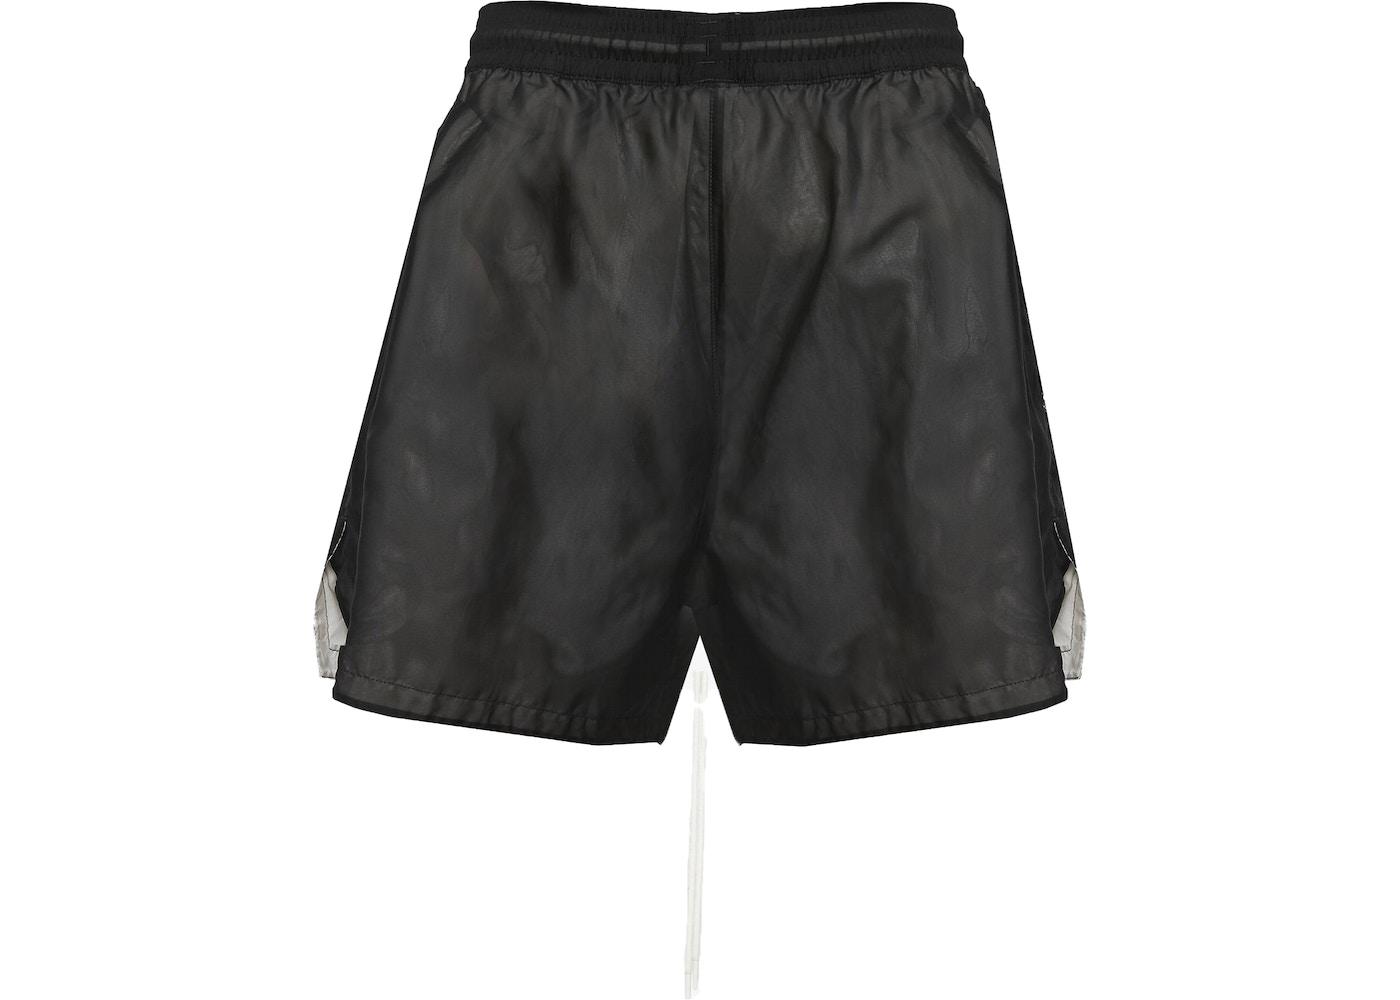 c07fb42a825 FEAR OF GOD x Nike Stretch Shorts Black Light Bone Sail Black - SS19